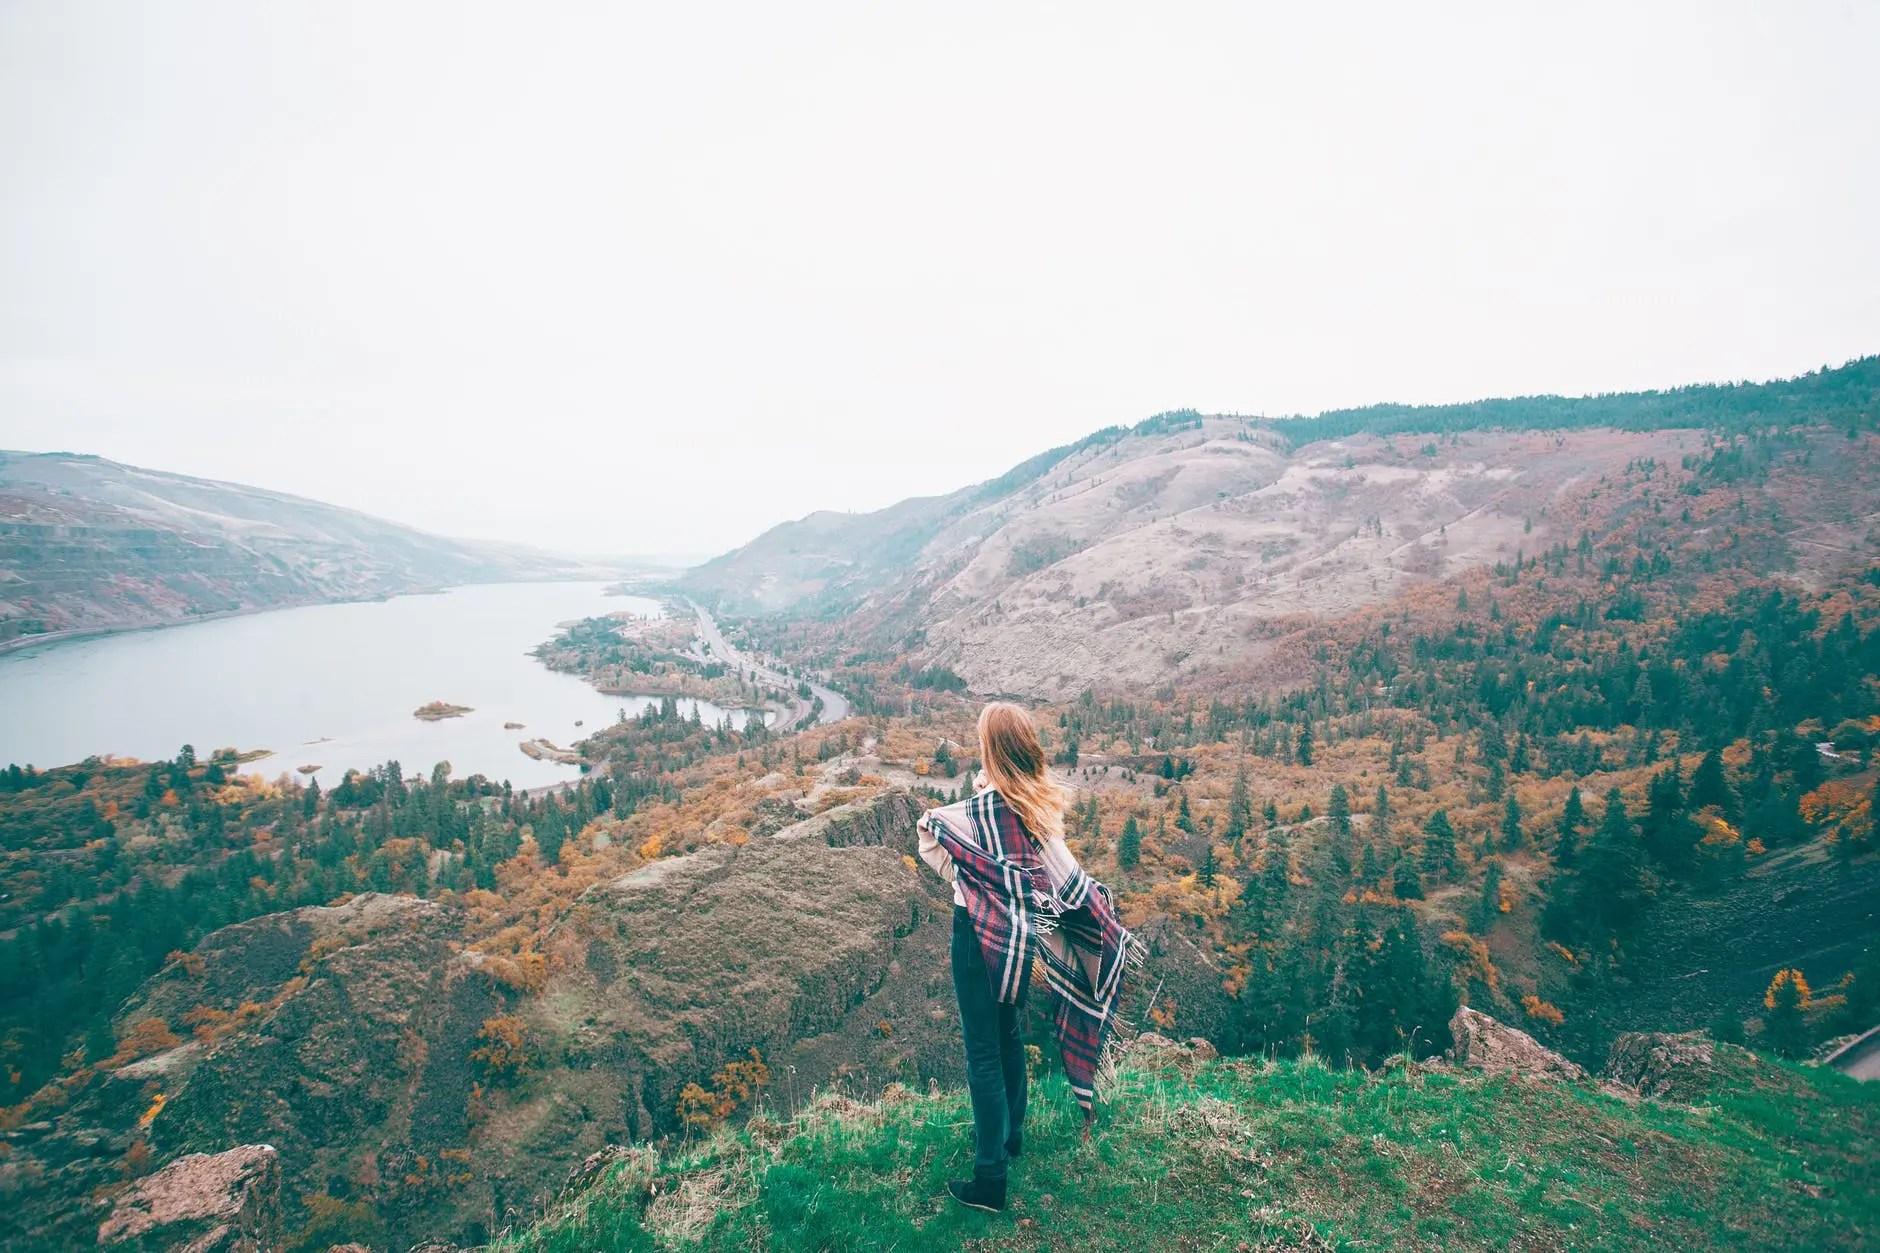 unrecognizable female tourist admiring lake in mountains